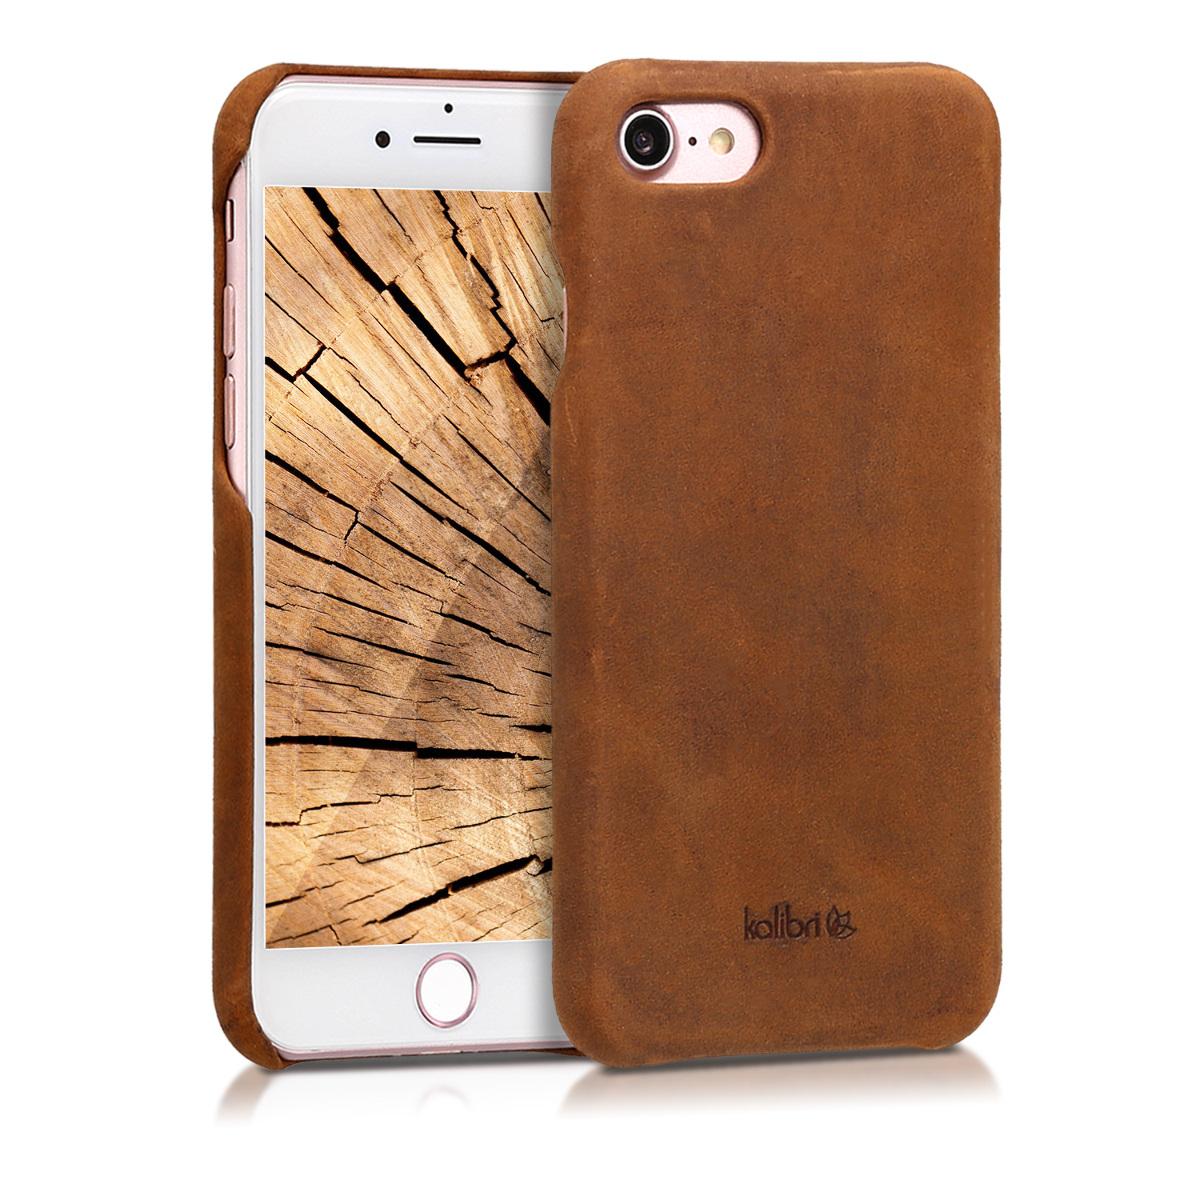 Kalibri Σκληρή Δερμάτινη Θήκη iPhone 8 / 7 - Brown (39345.05)